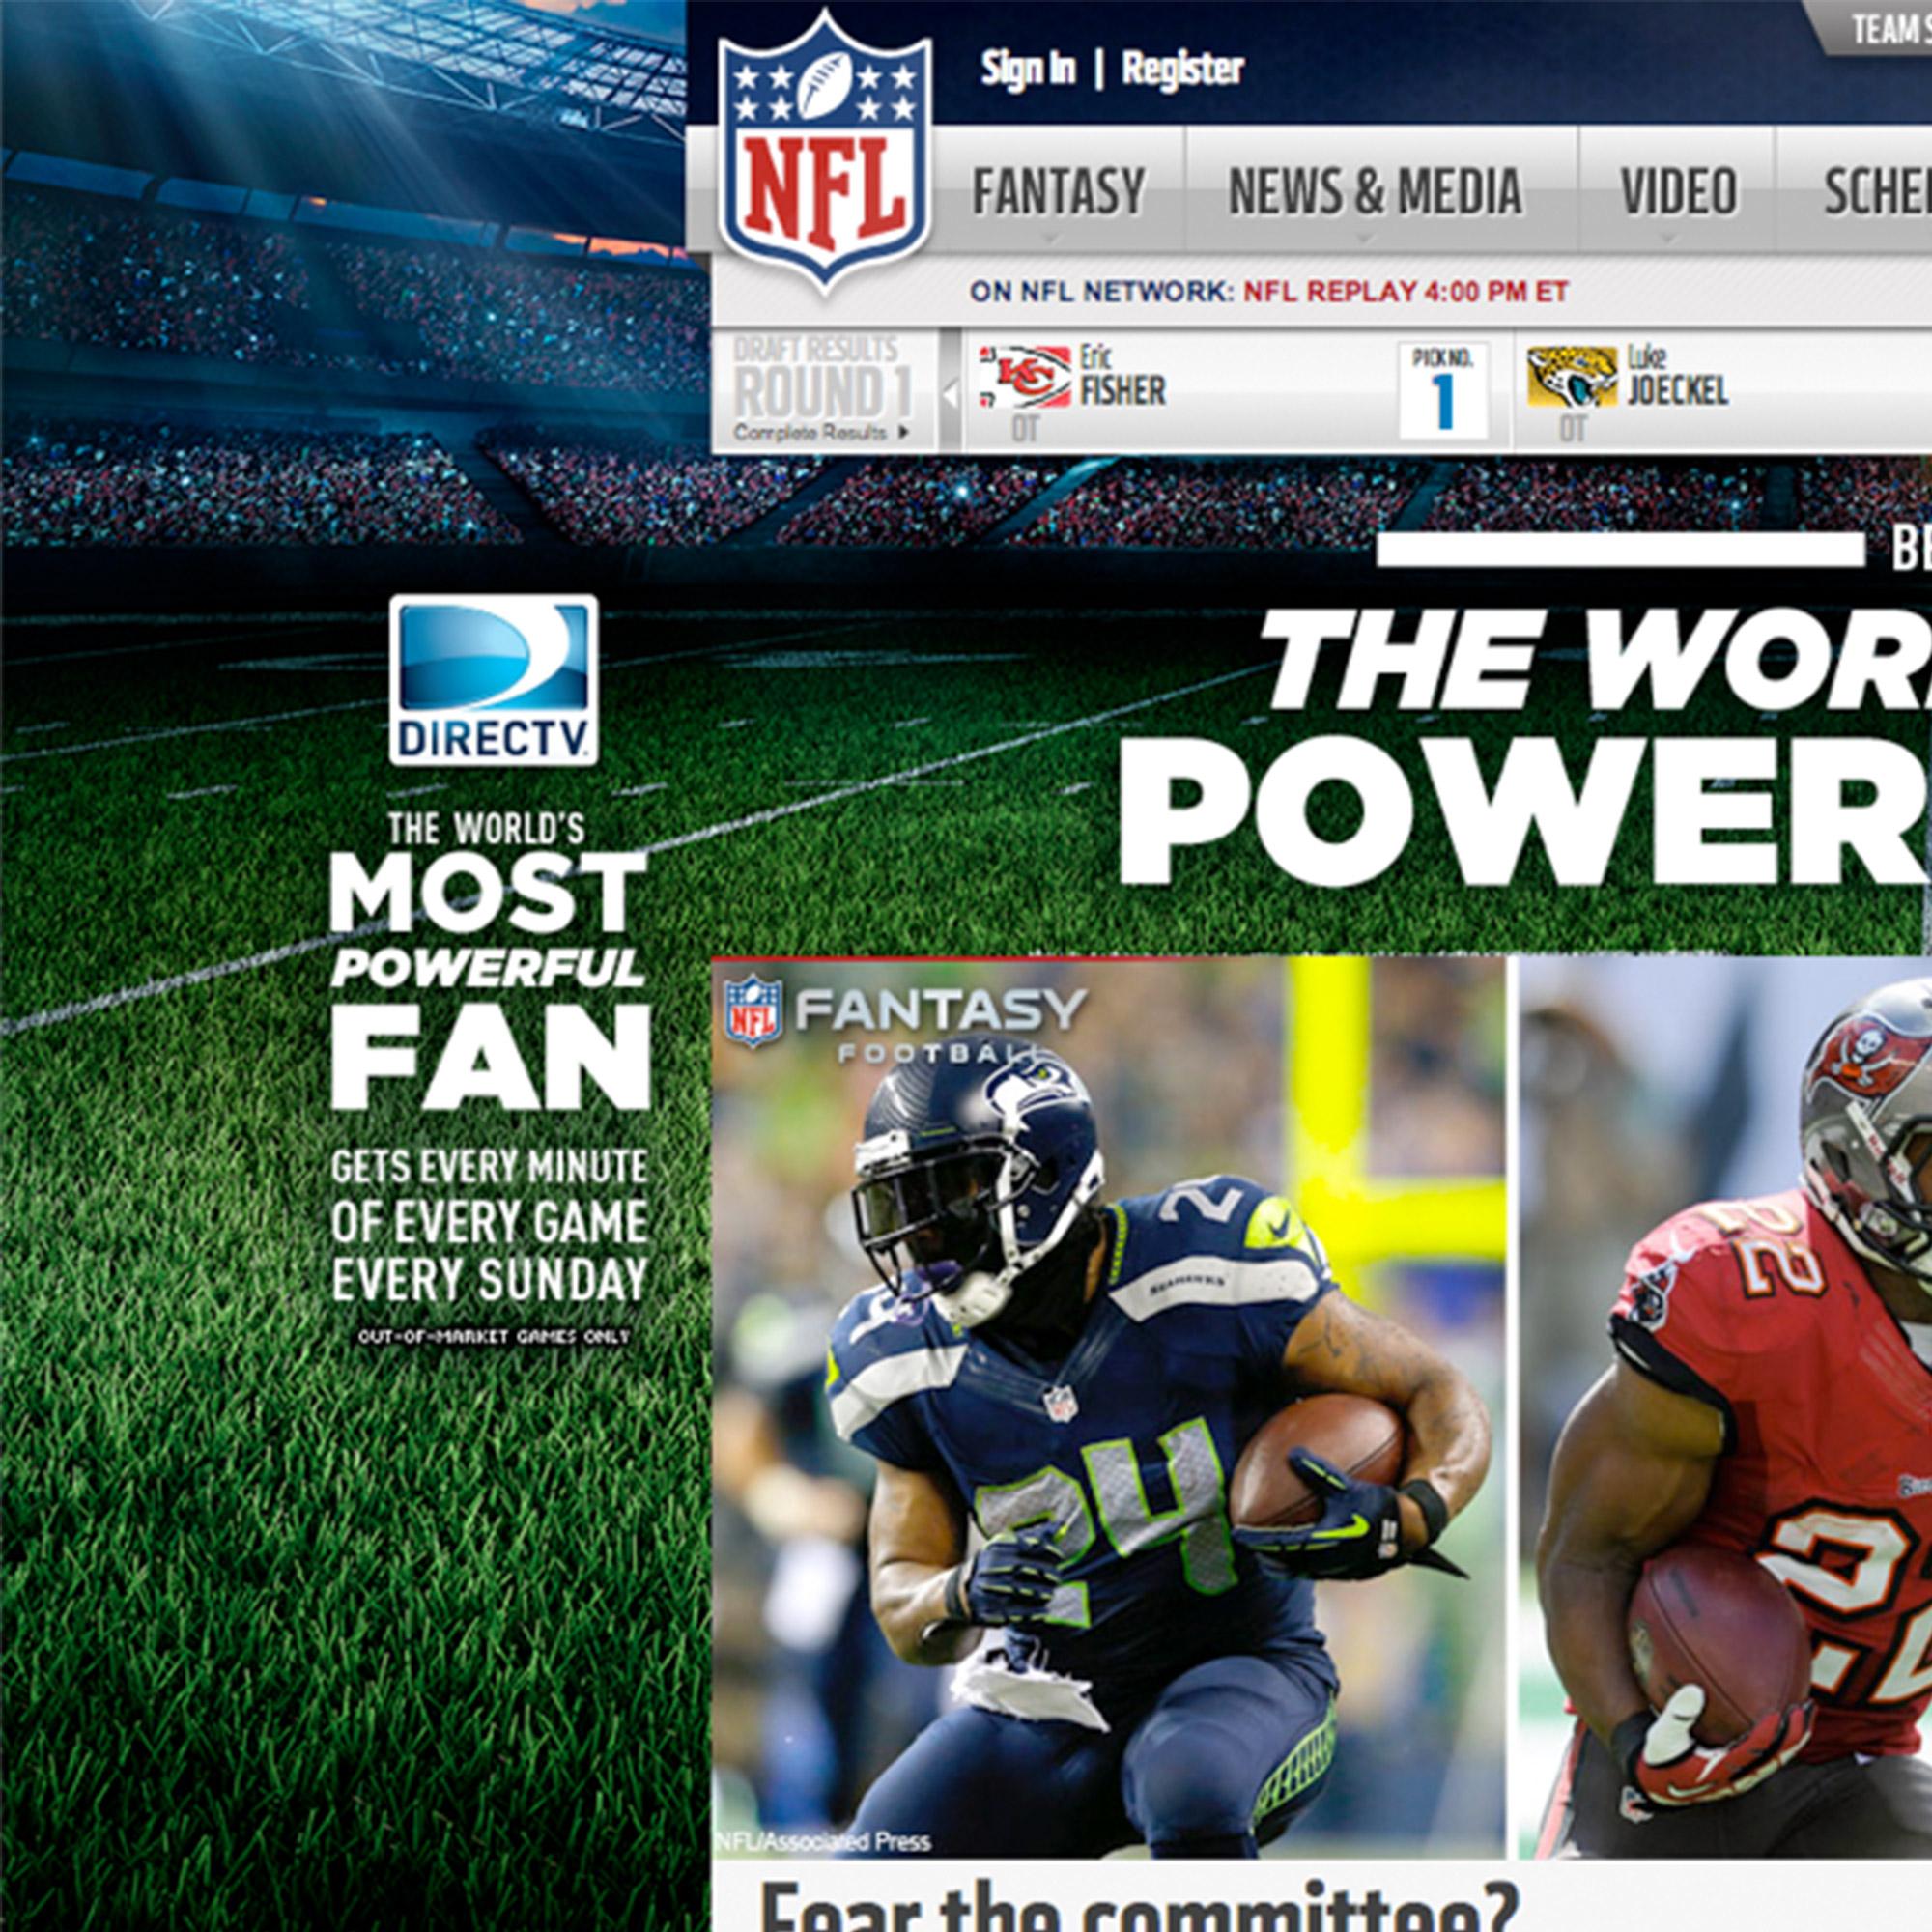 DIRECTV - NFL Sunday Ticket portfolio item 3